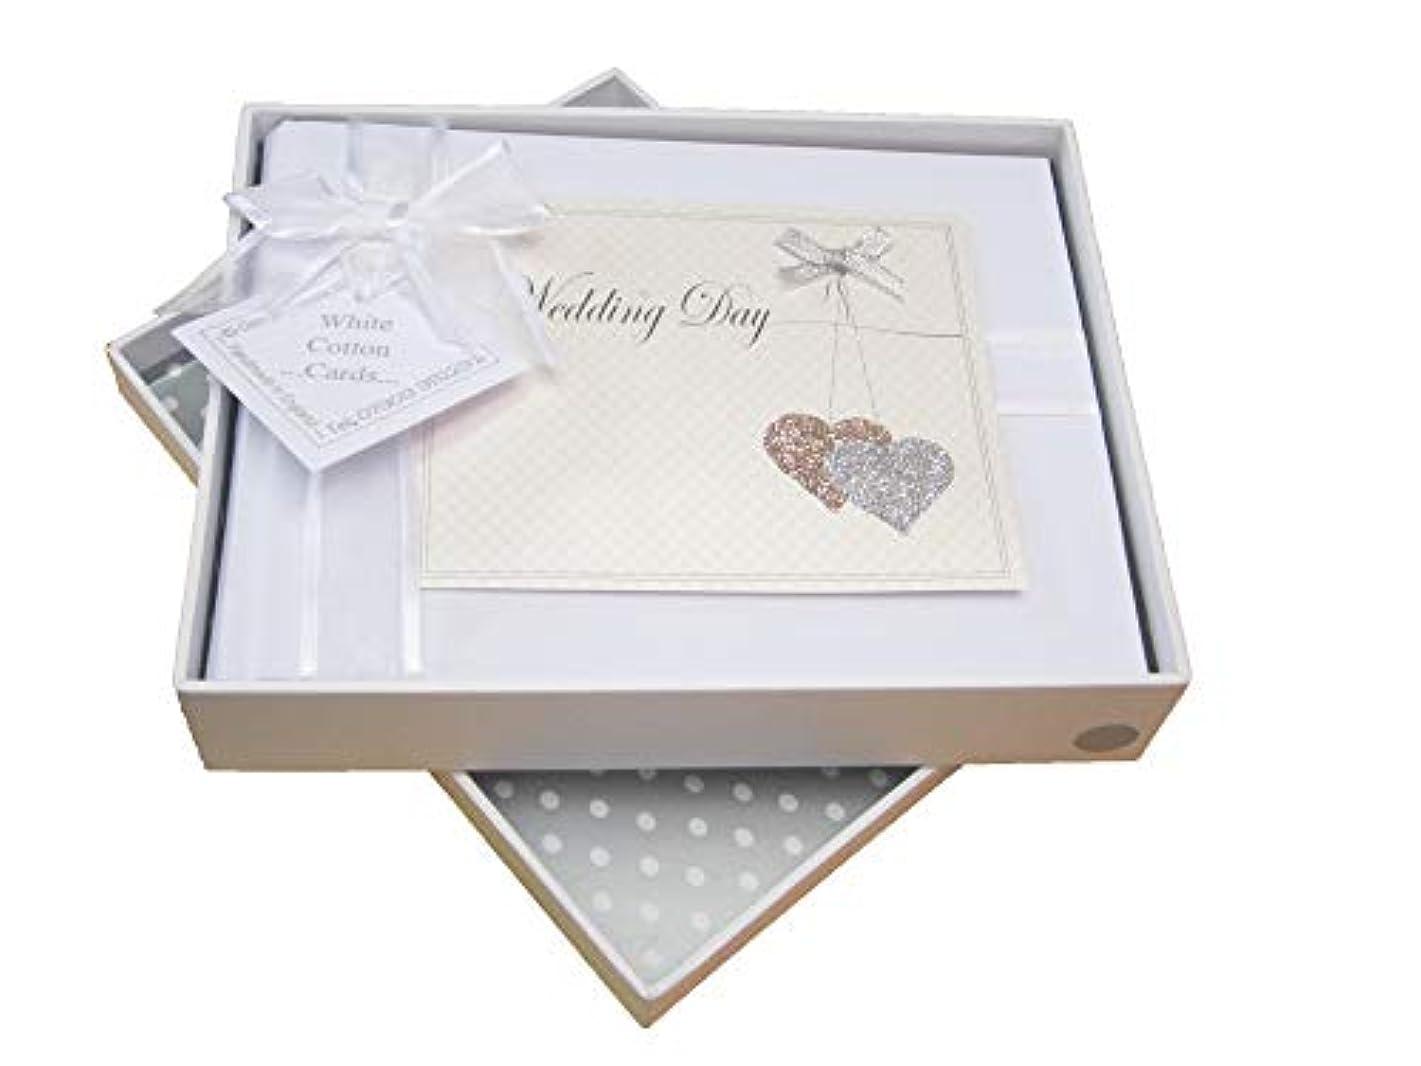 White Cotton Cards Wedding Day Photo Album, Love Hearts Design (LLH1S)